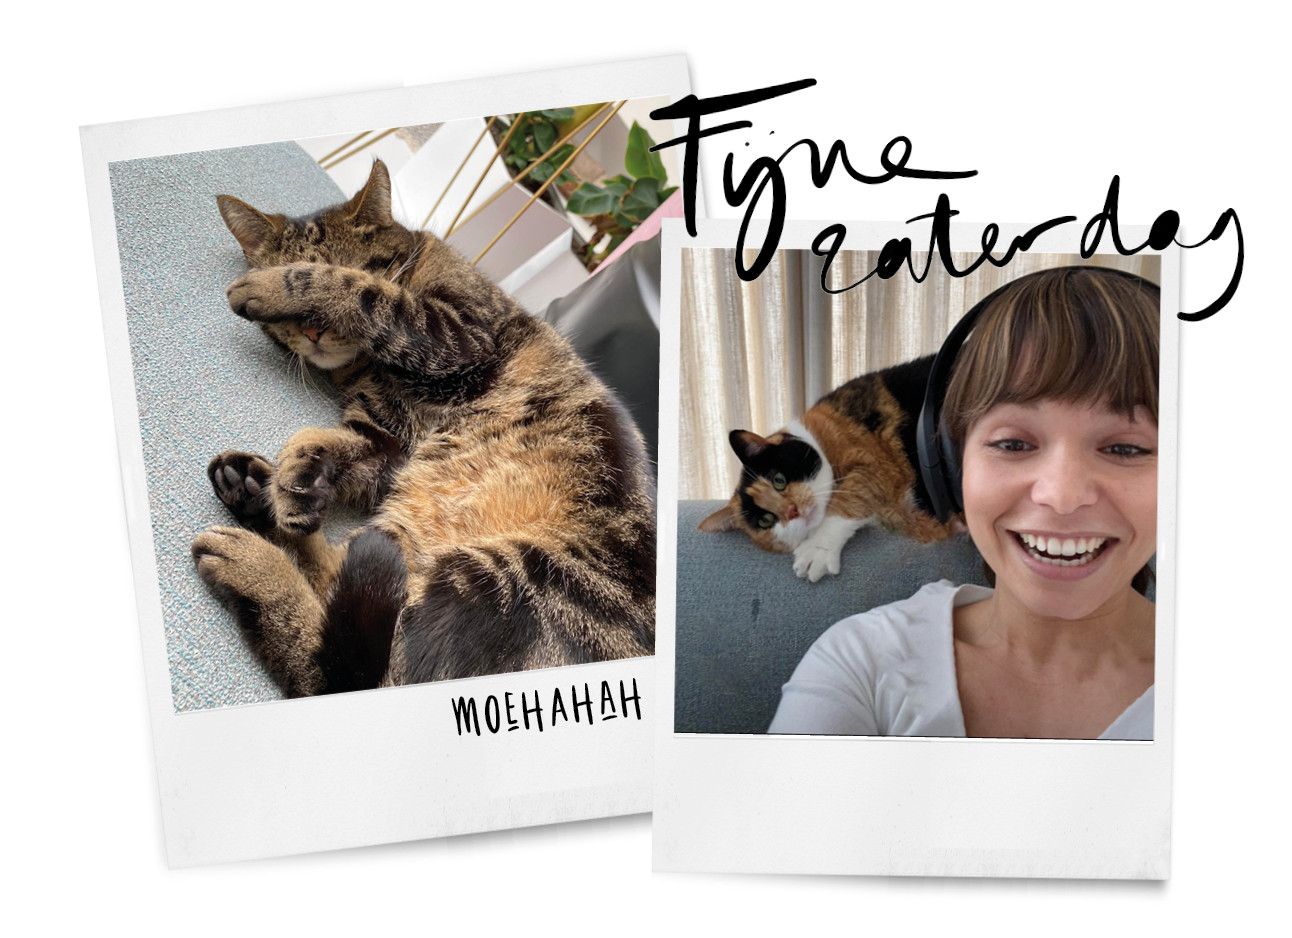 Kiki met haar katten thuis lachend